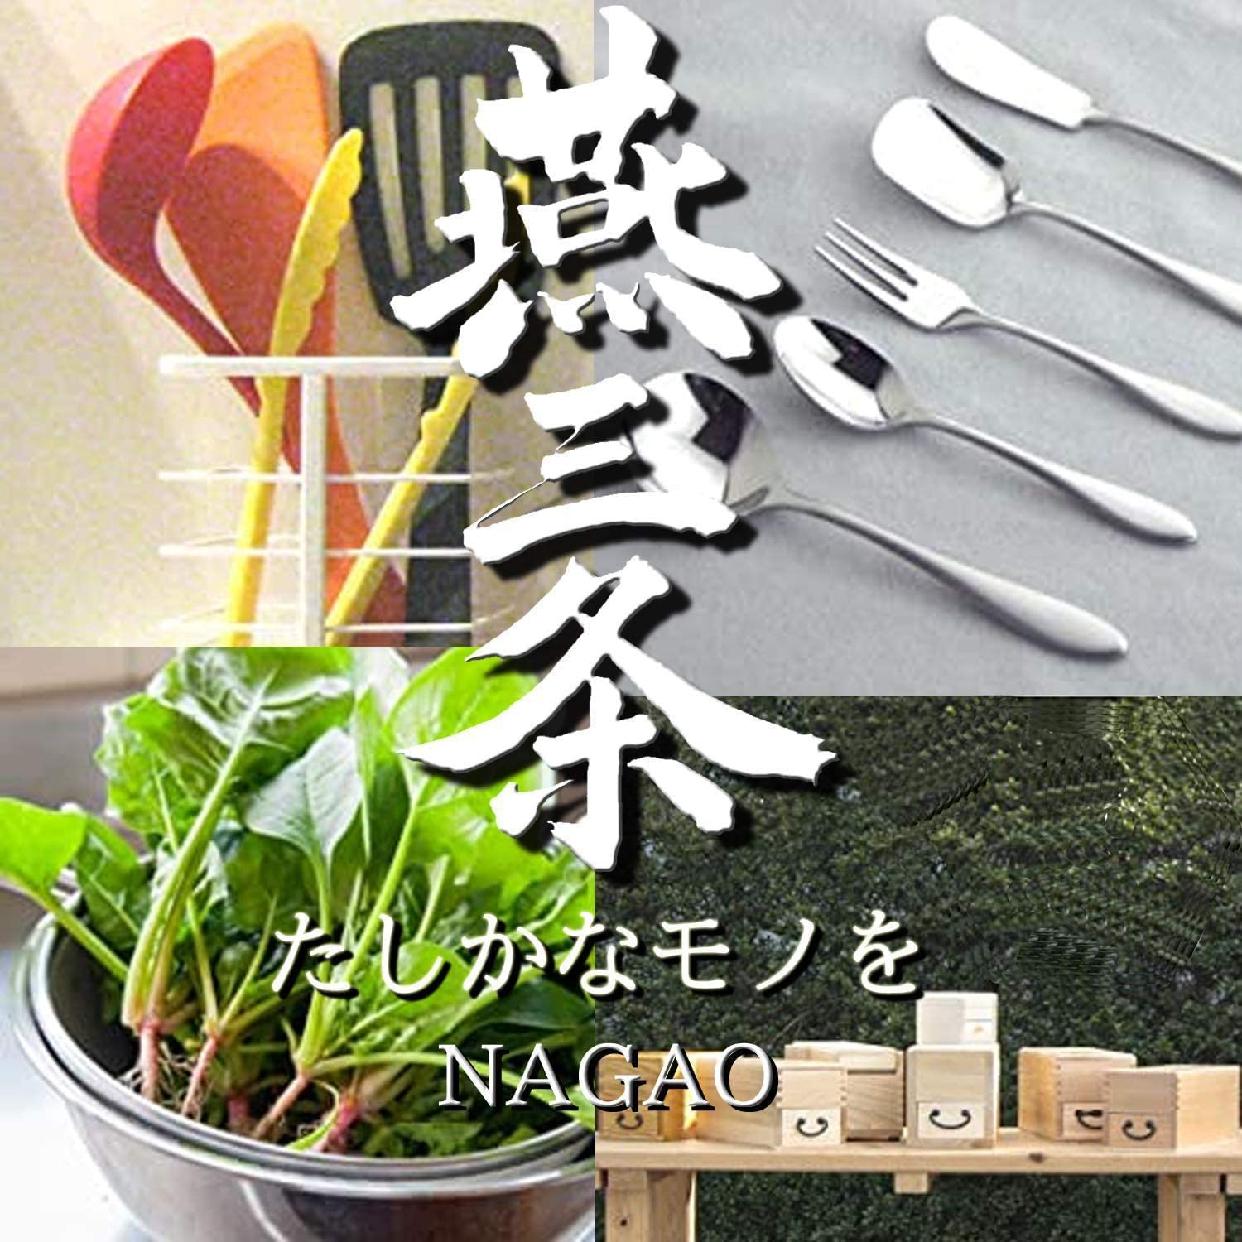 NAGAO(ナガオ) 燕三条 18-8ステンレス 泡立て 線材24本の商品画像7